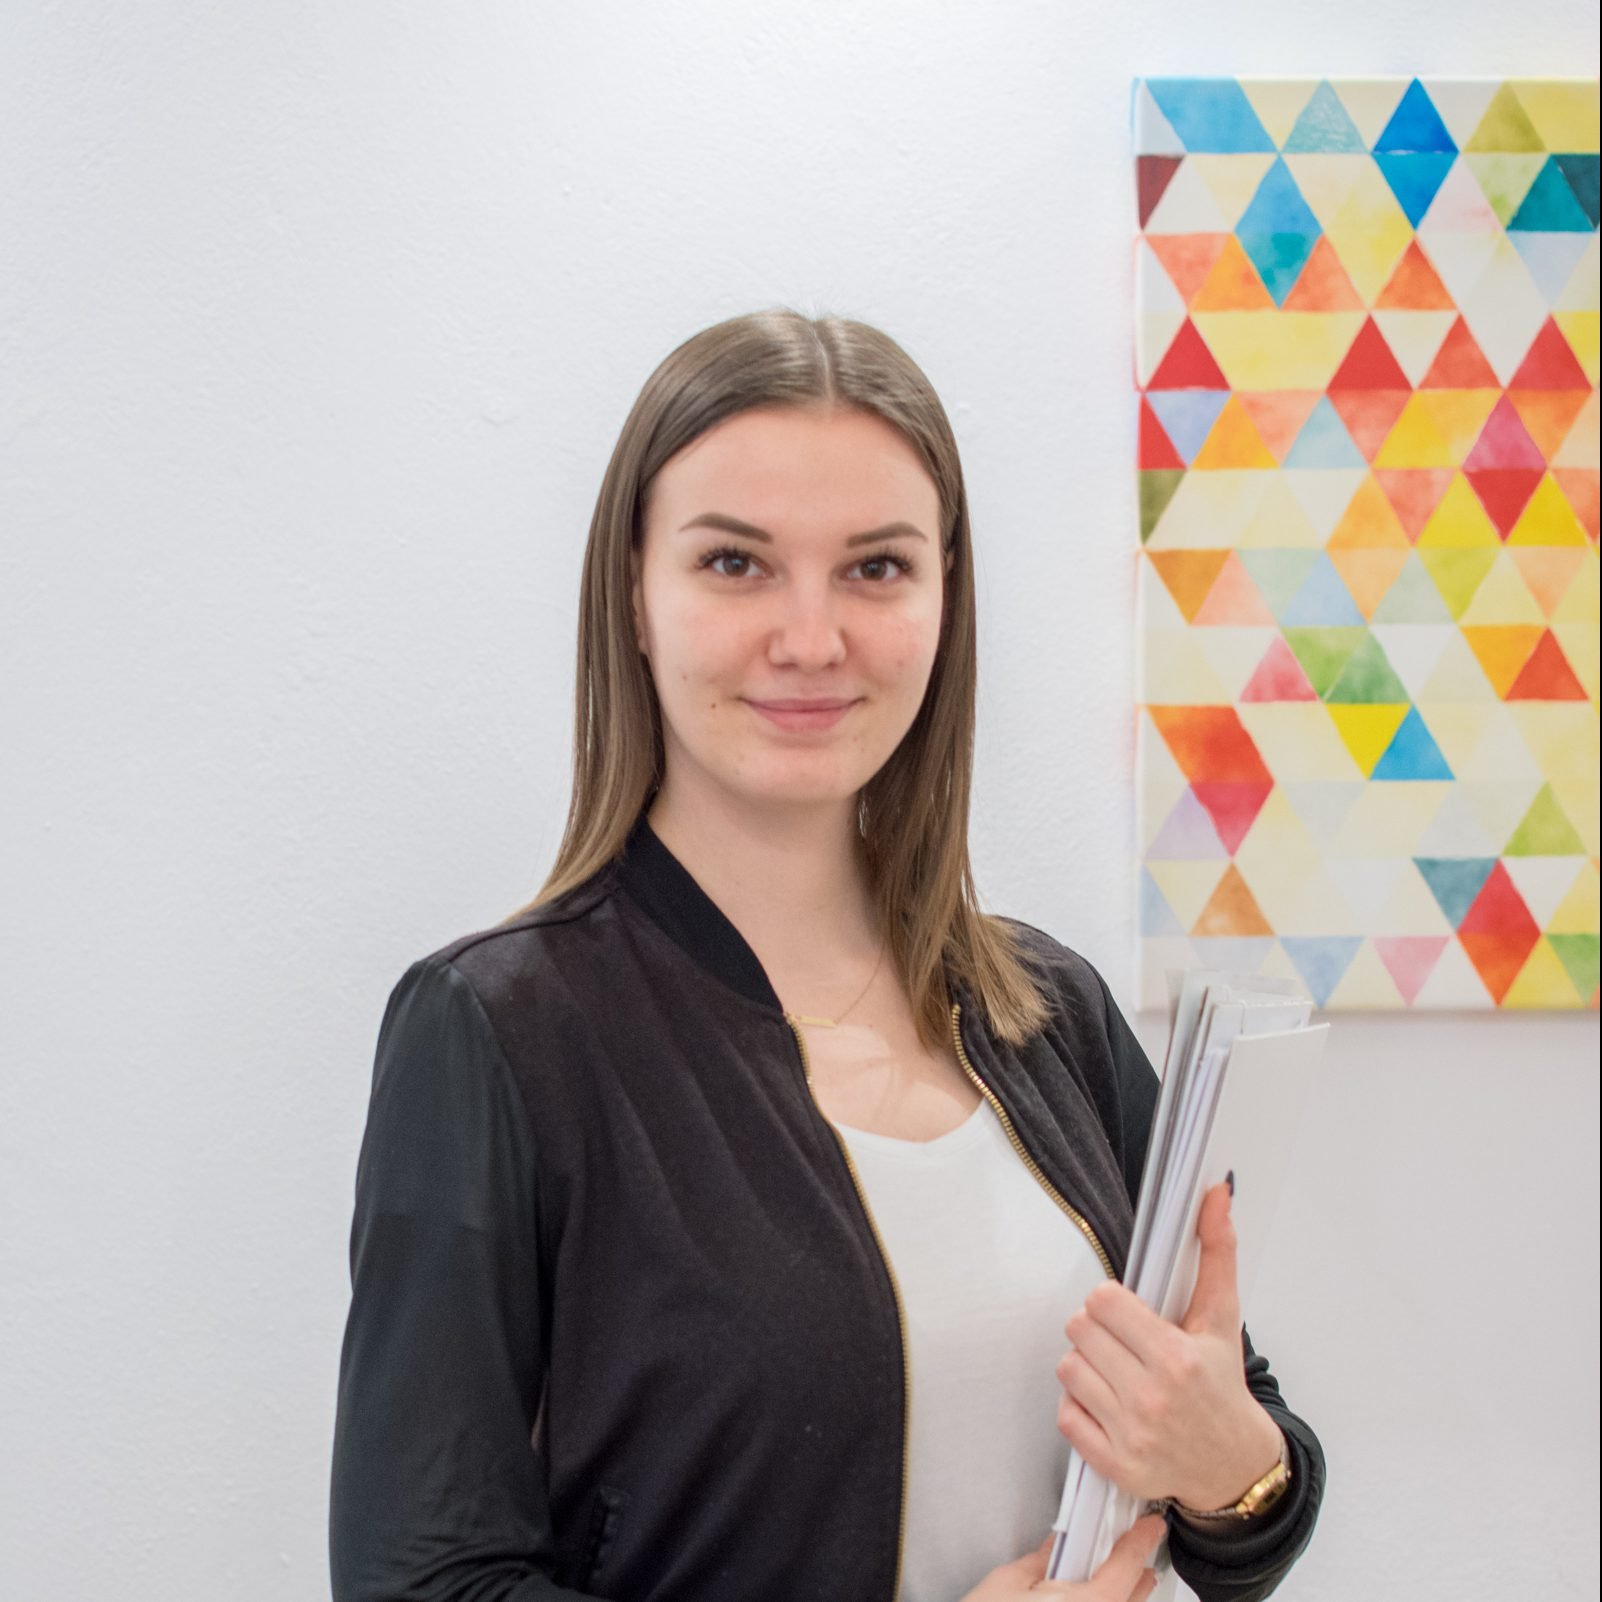 Karolina Brzoska